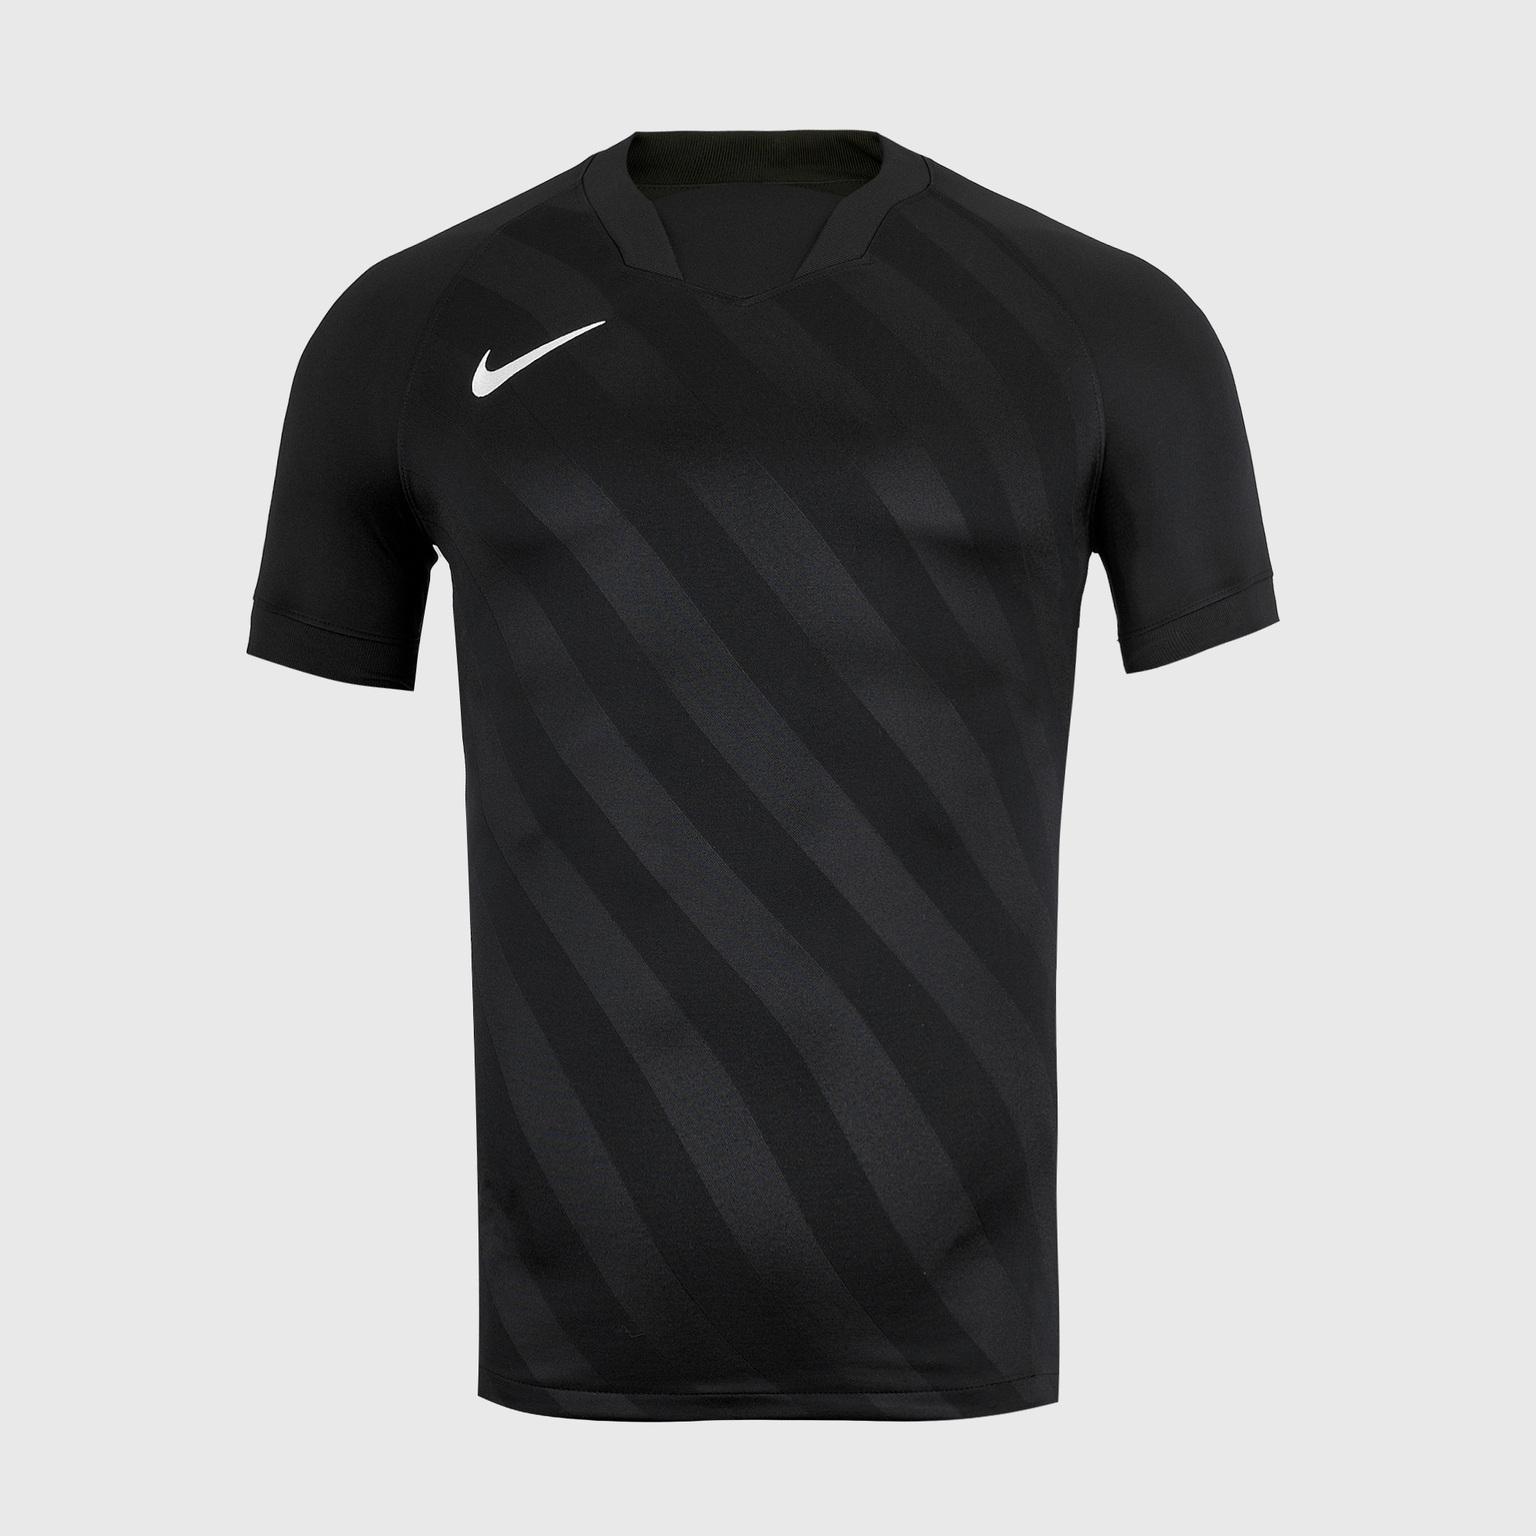 Футболка игровая Nike Dry Challenge III BV6703-010 футболка подростковая nike neymar dry top cd2228 010